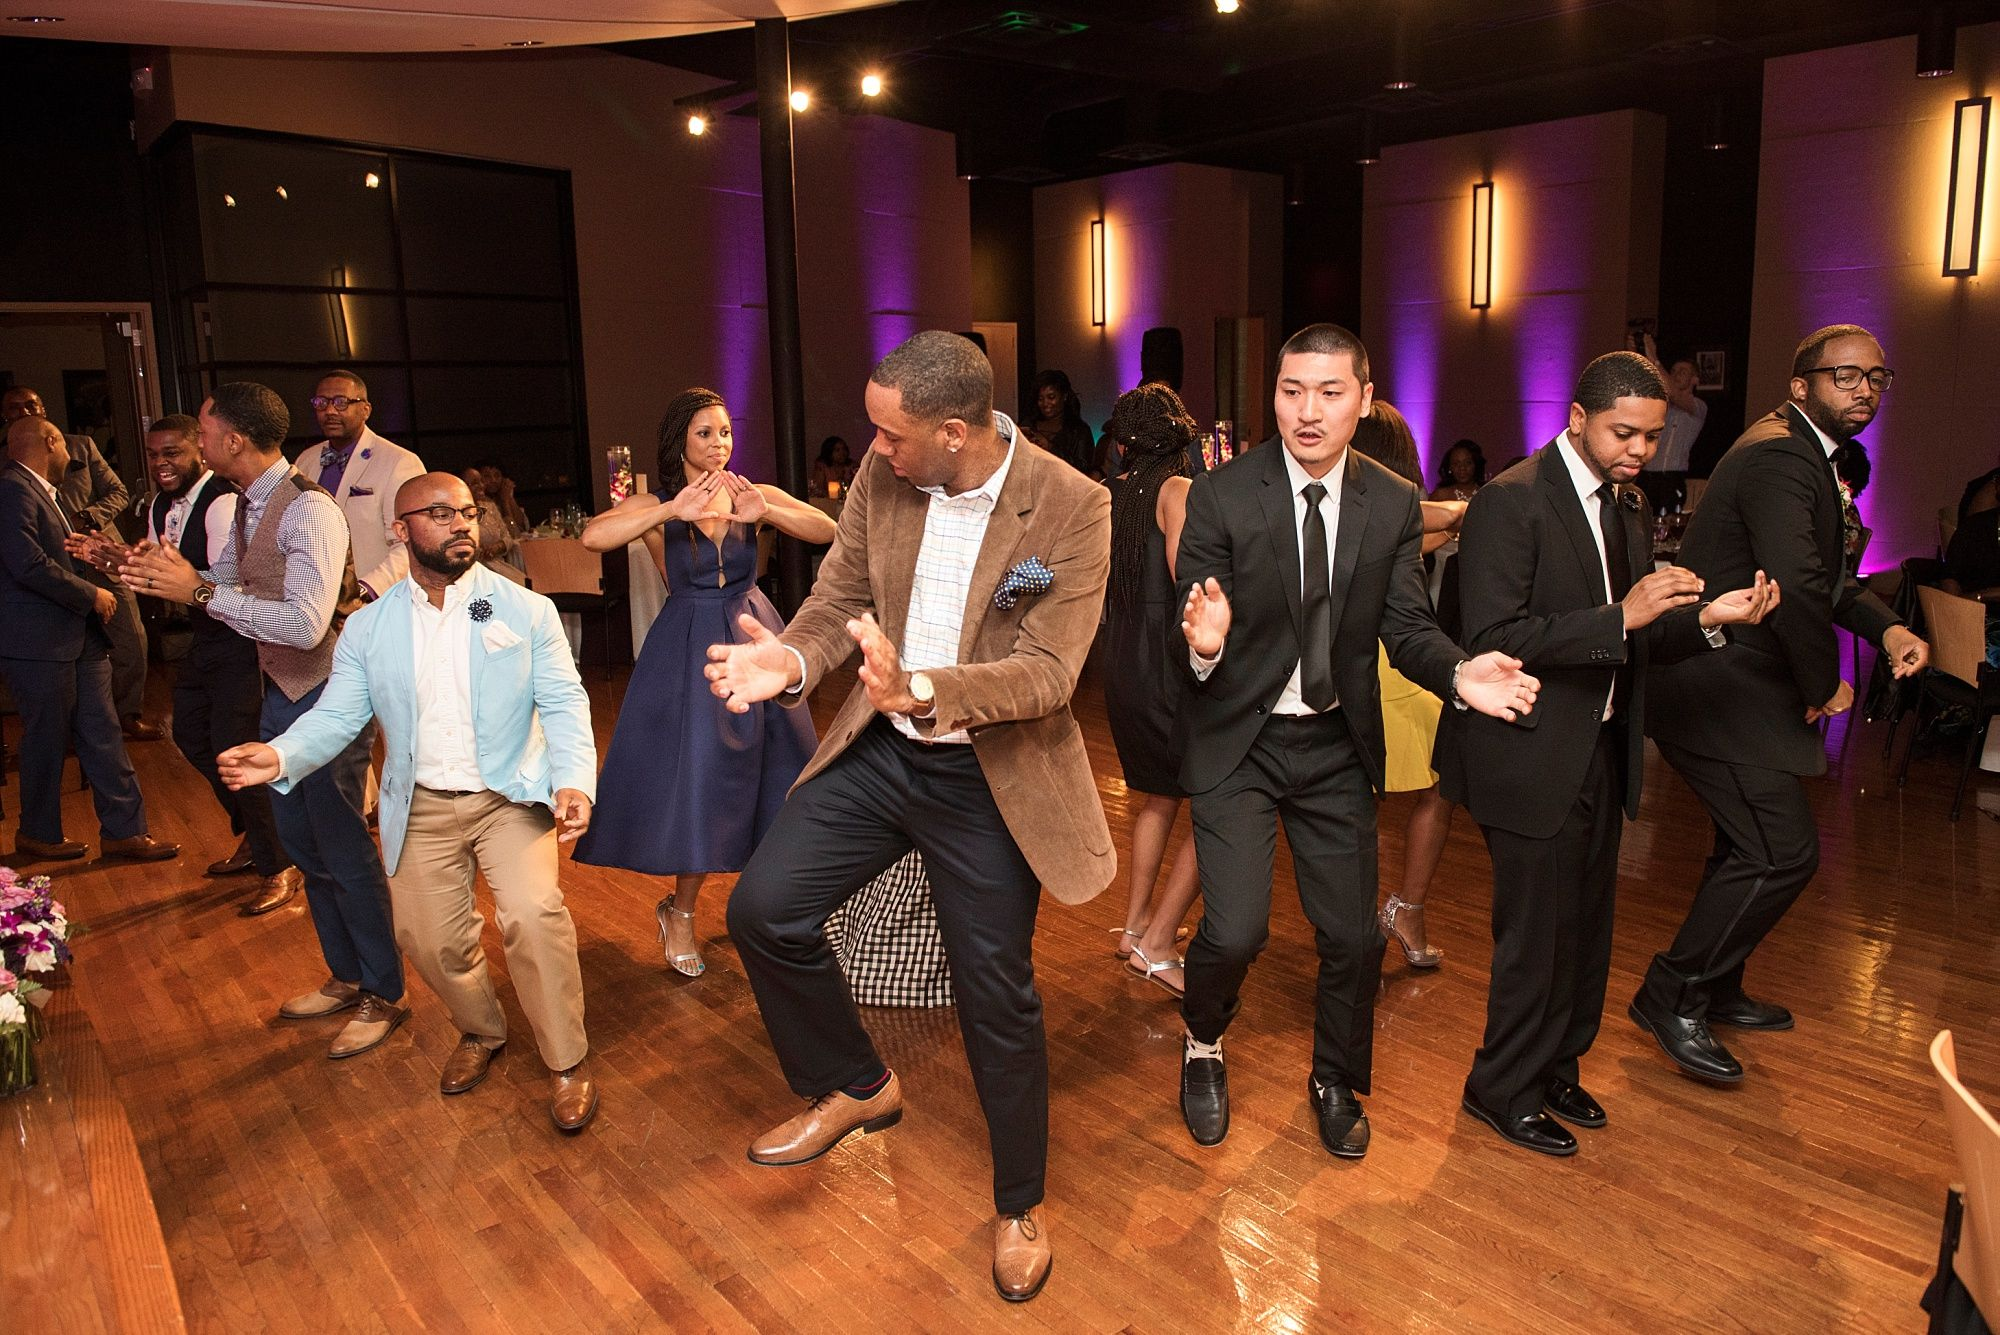 Urban Nashville Wedding At W O Smith Music School Fraternity Sorority